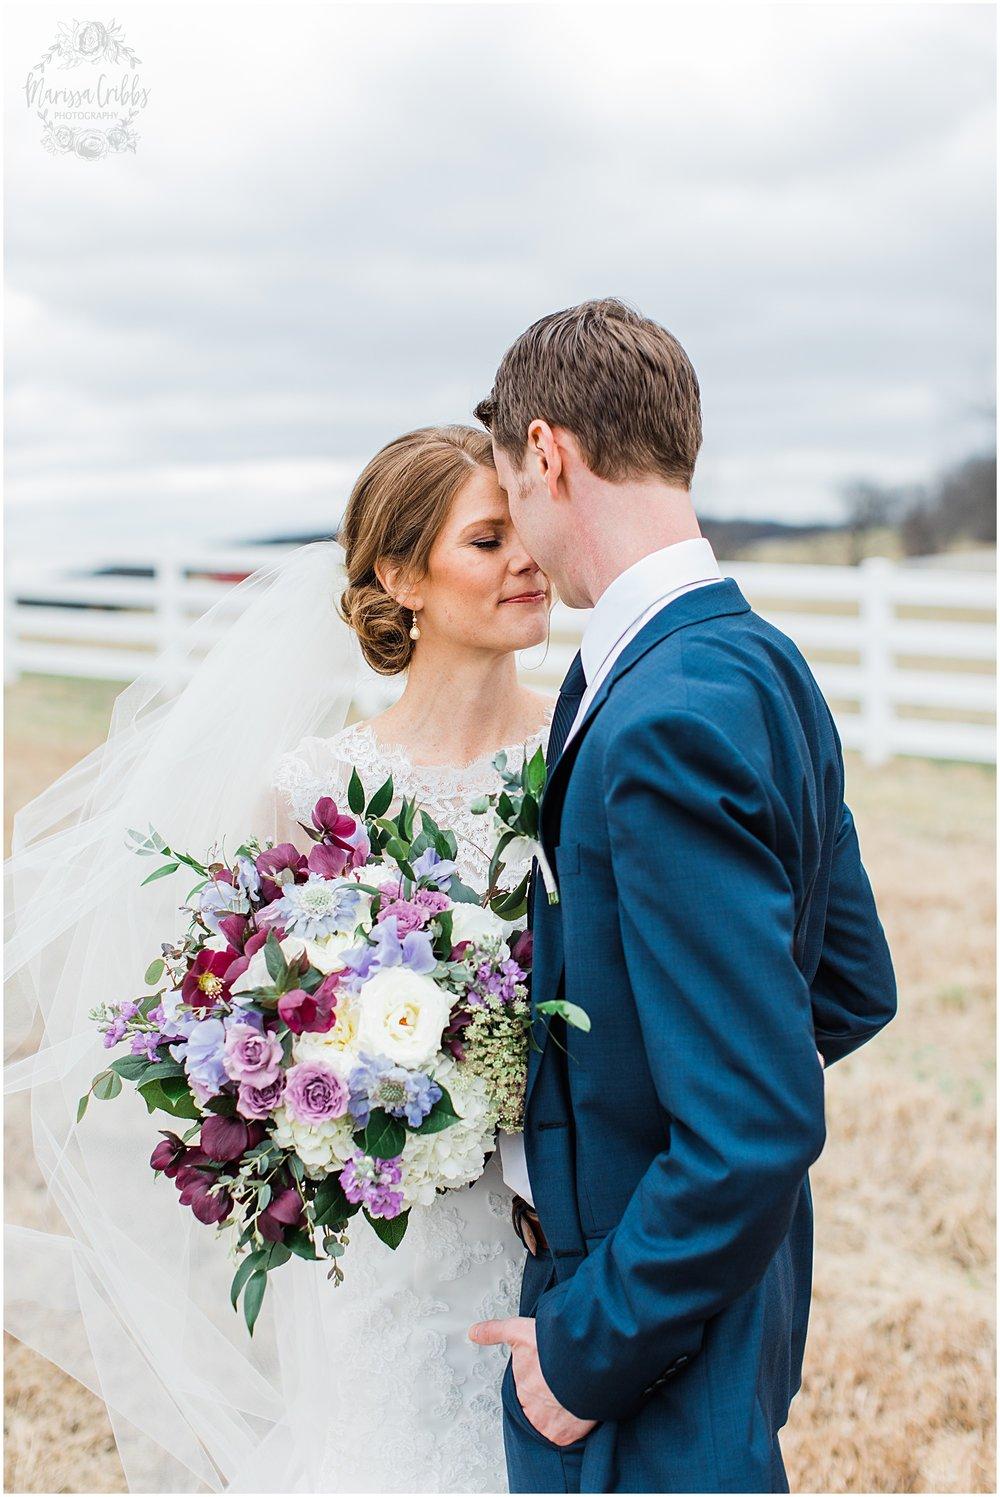 JACOBI WEDDING | 1890 EVENT SPACE | MARISSA CRIBBS PHOTOGRAPHY_4284.jpg